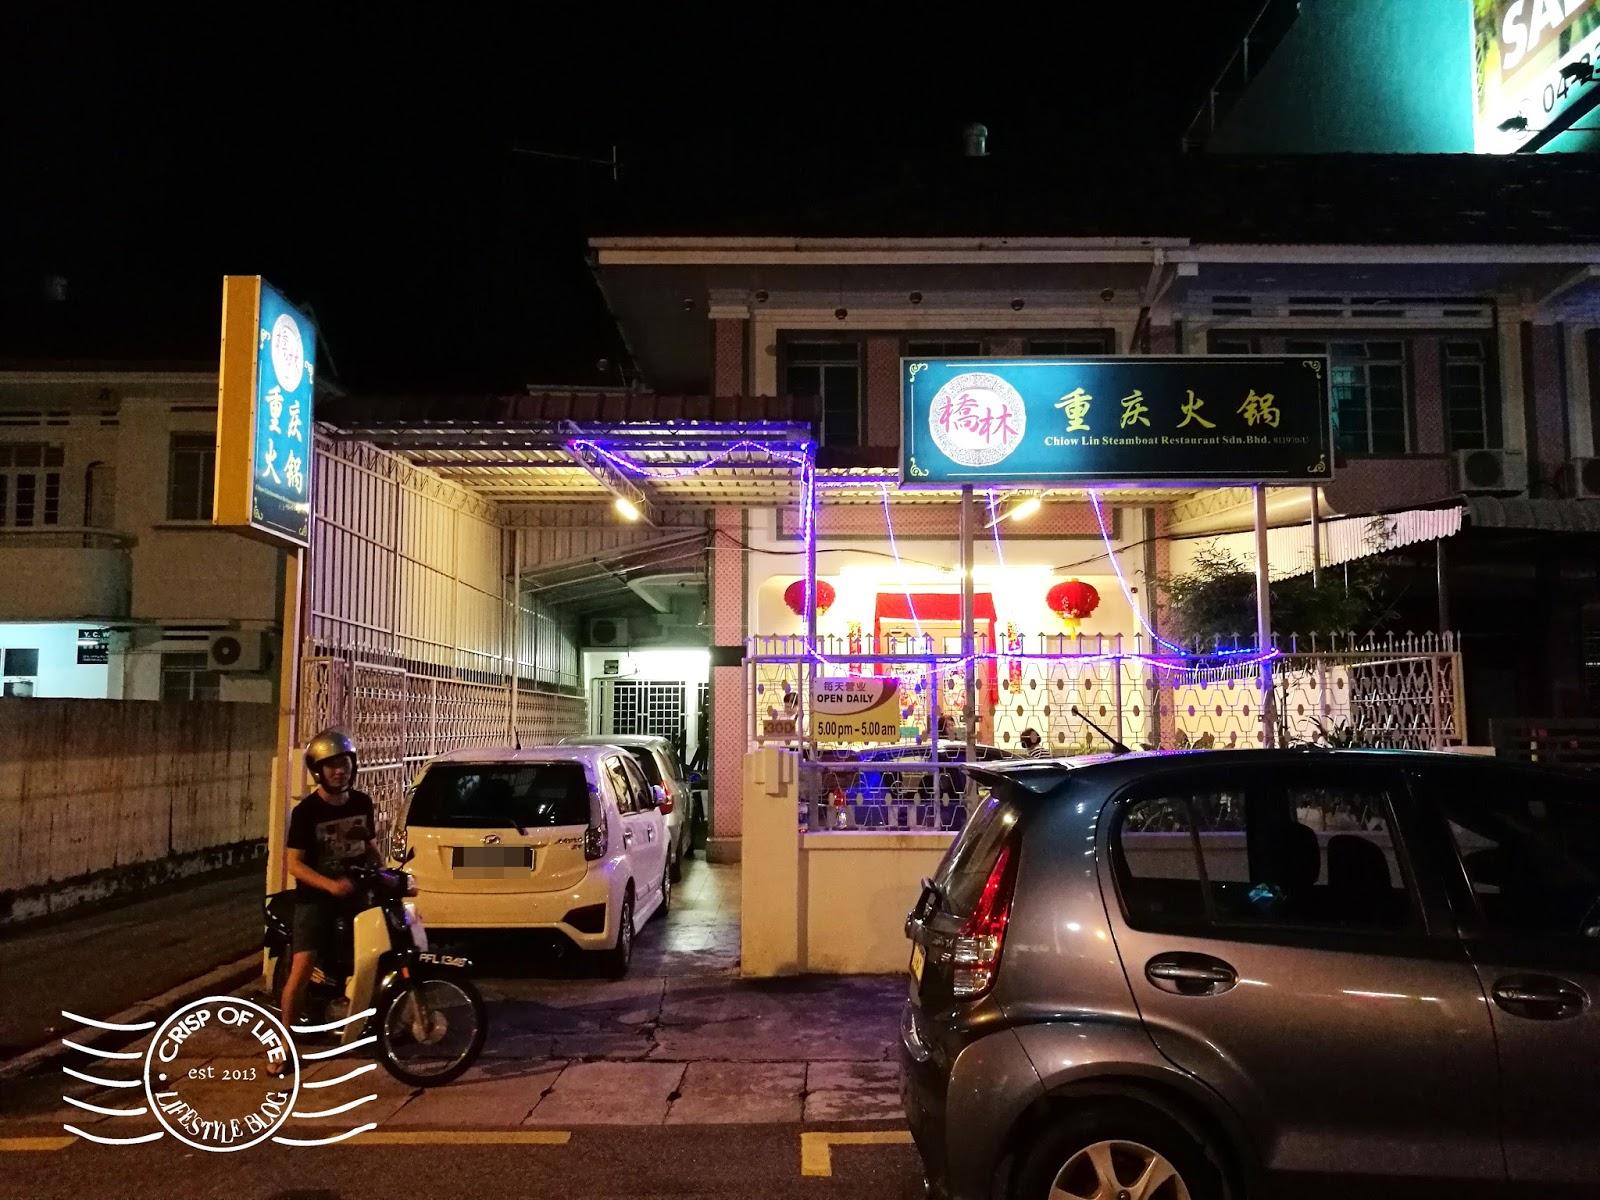 Chiow Ling Steamboat 桥林重庆火锅 Abu Siti Lane